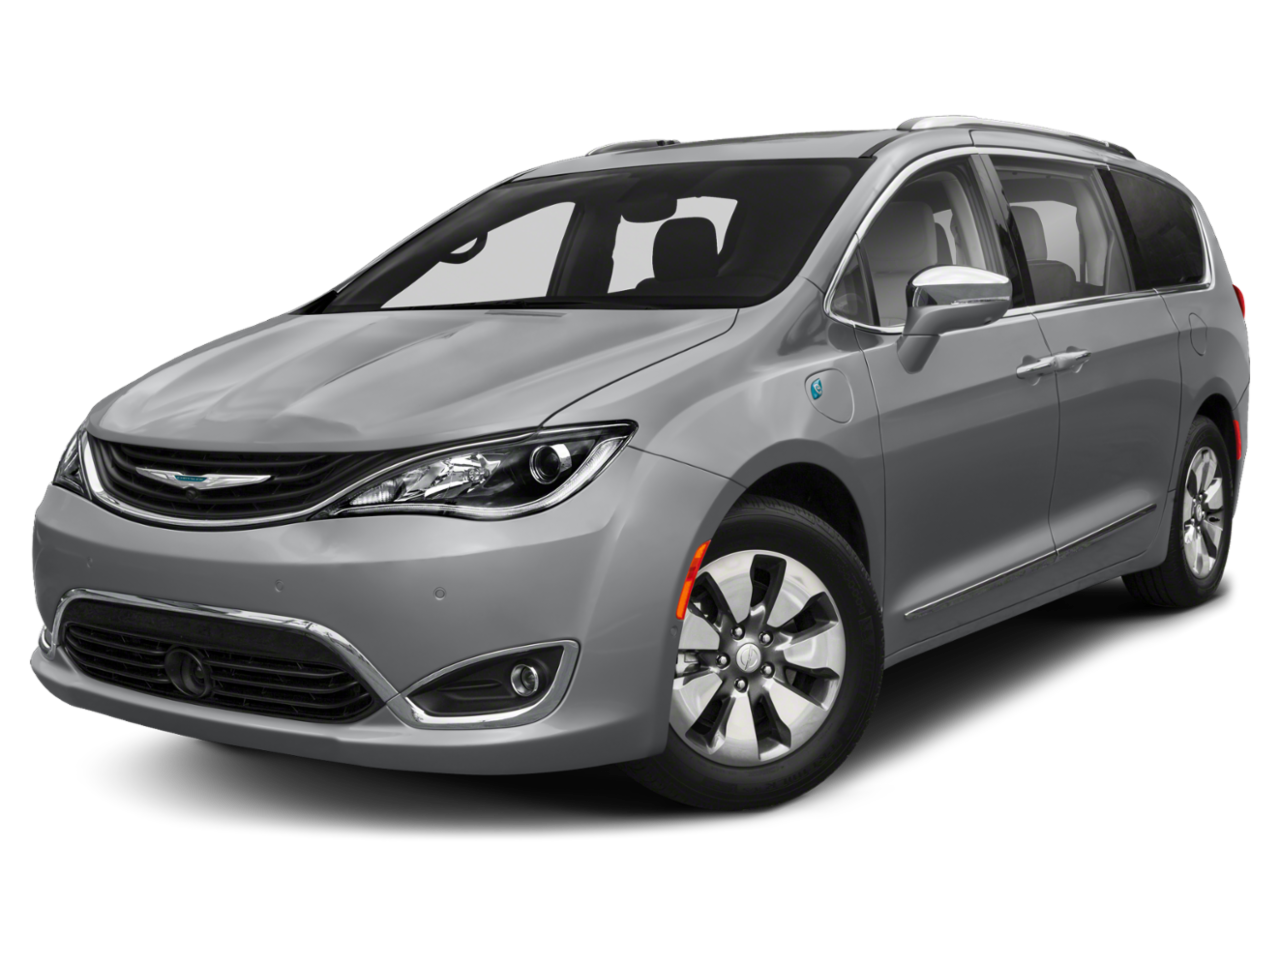 2020 CHRYSLER Pacifica Hybrid Hybrid Limited 35th Anniversary Passenger Van